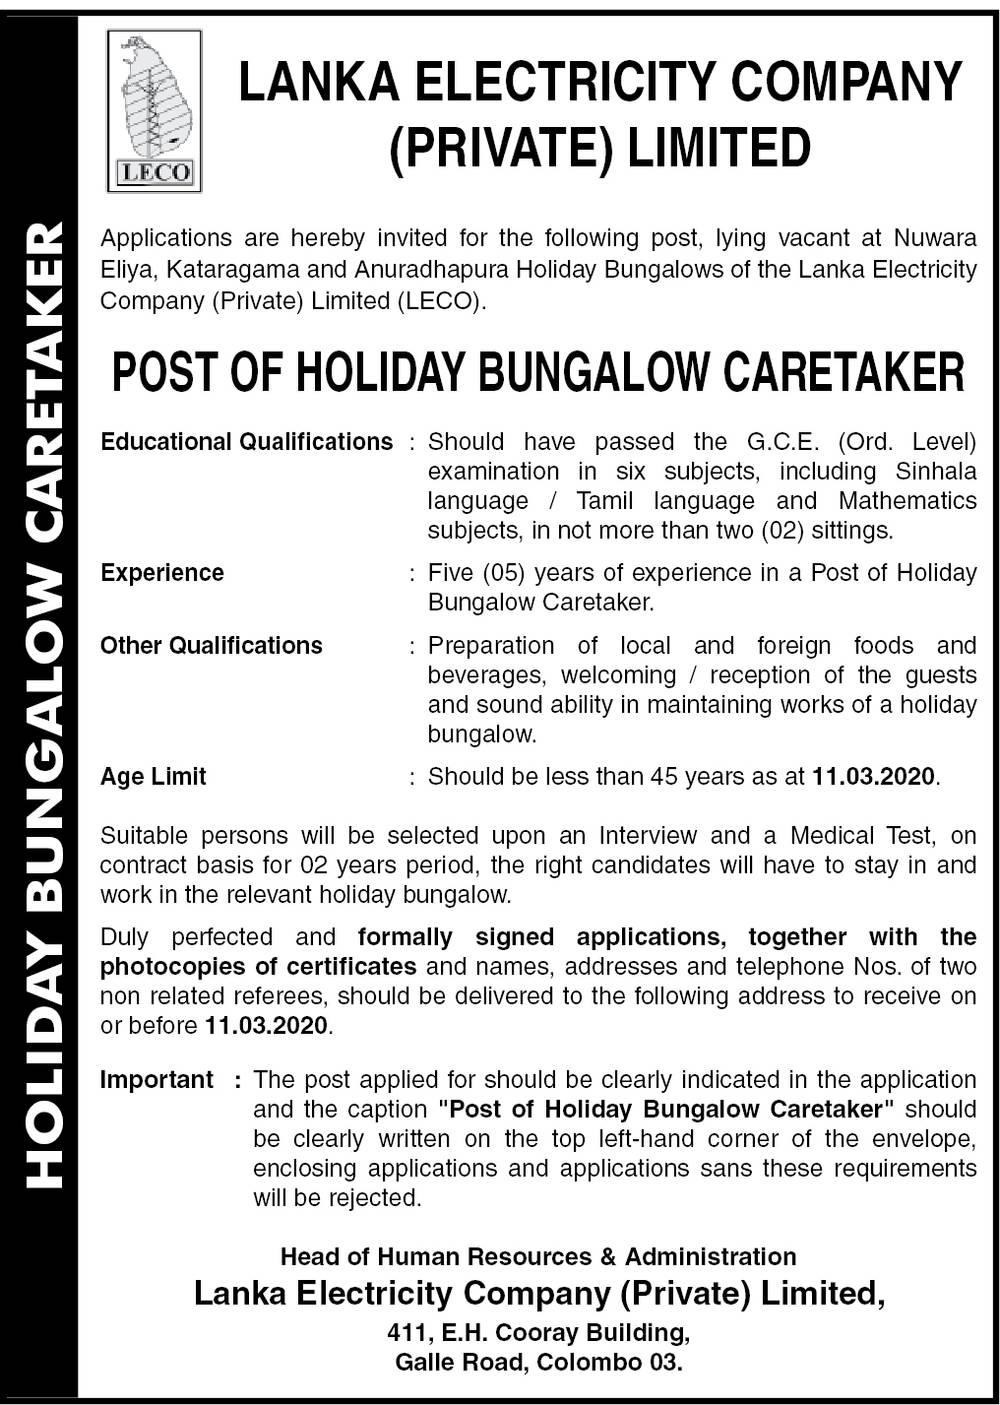 Holiday Bungalow Caretaker - Lanka Electricity Company (Pvt) Ltd